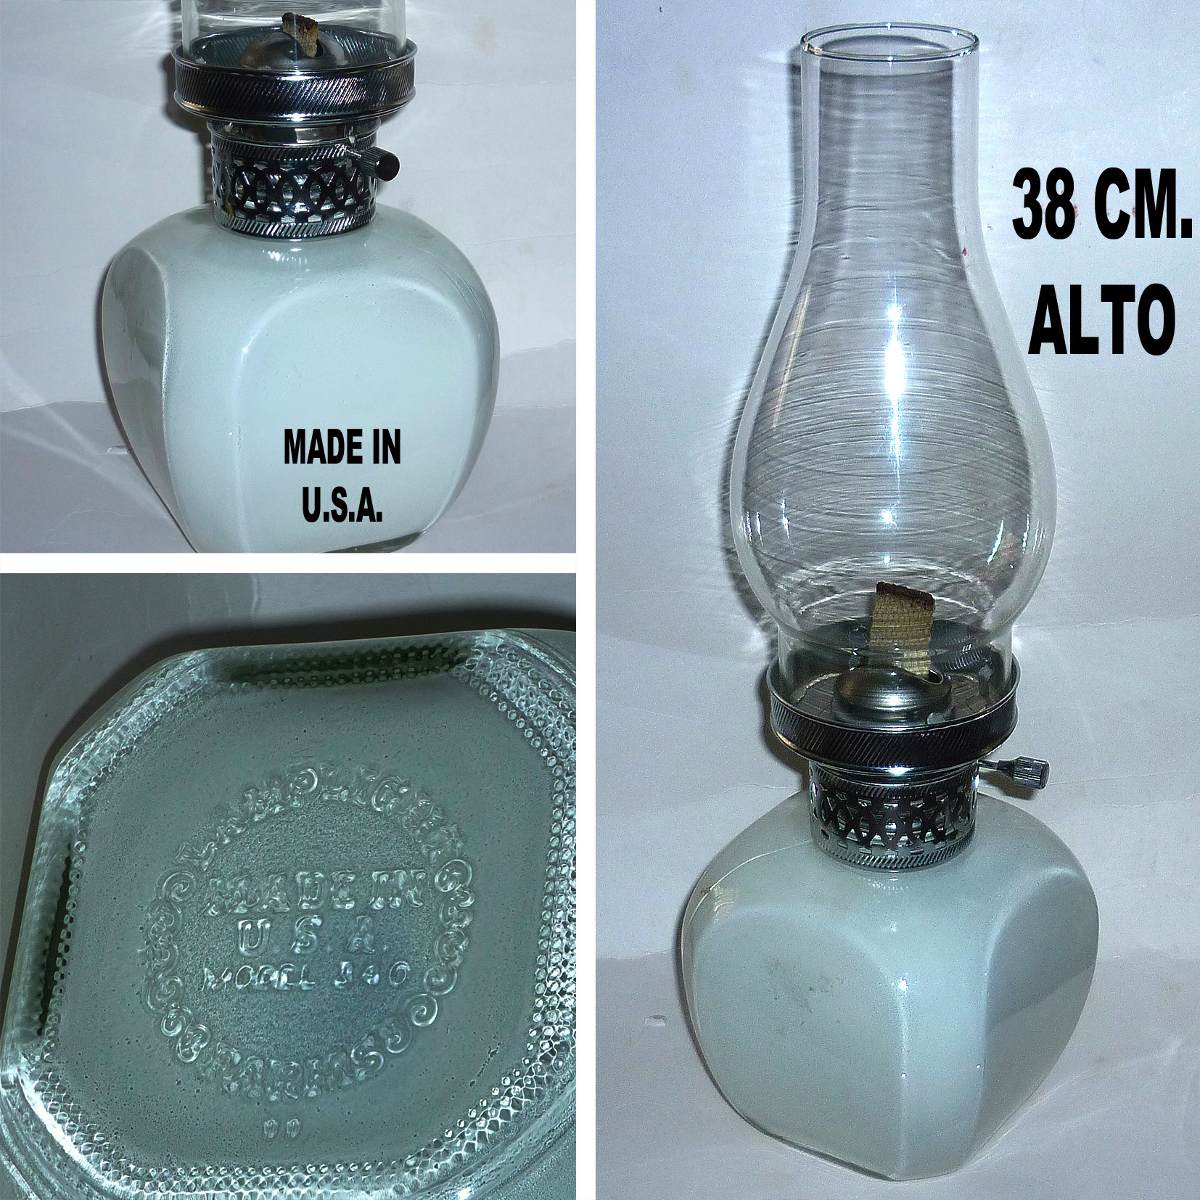 L mpara parafina retro 70 made in u s a sellada impecable - Lampara de parafina ...